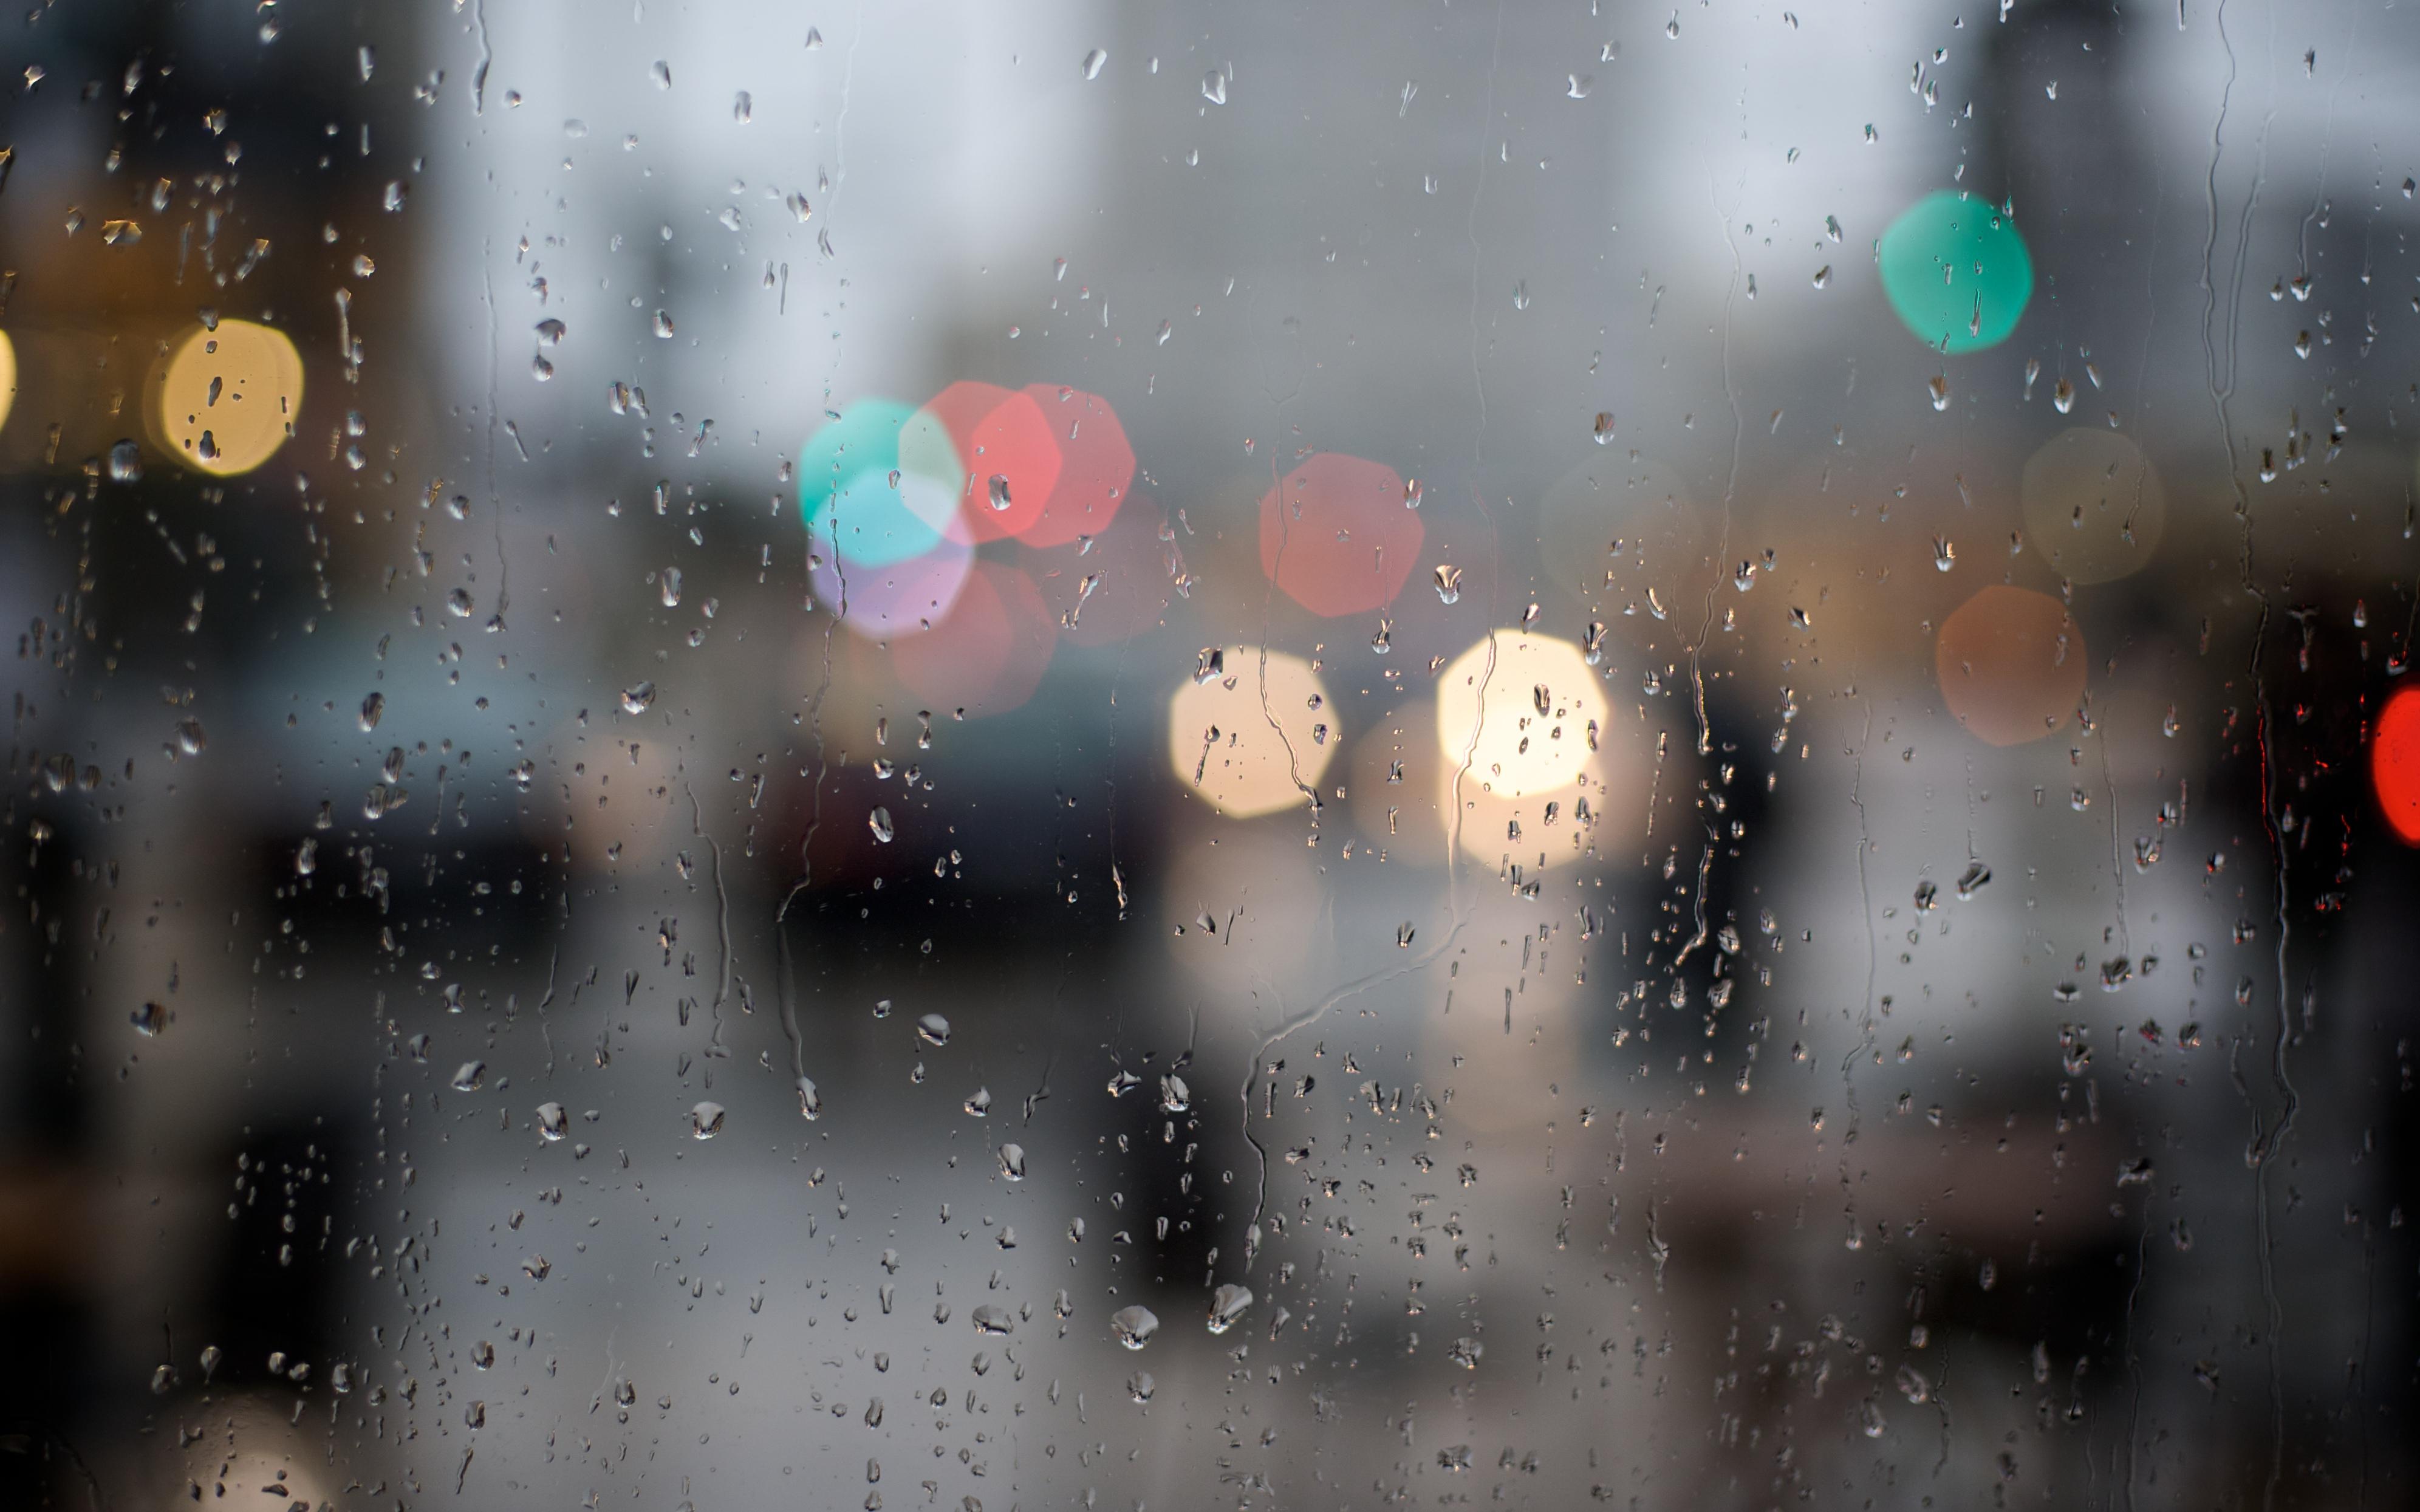 Download Wallpaper der Woche Rainy Day JPG 22 MB 3984x2489